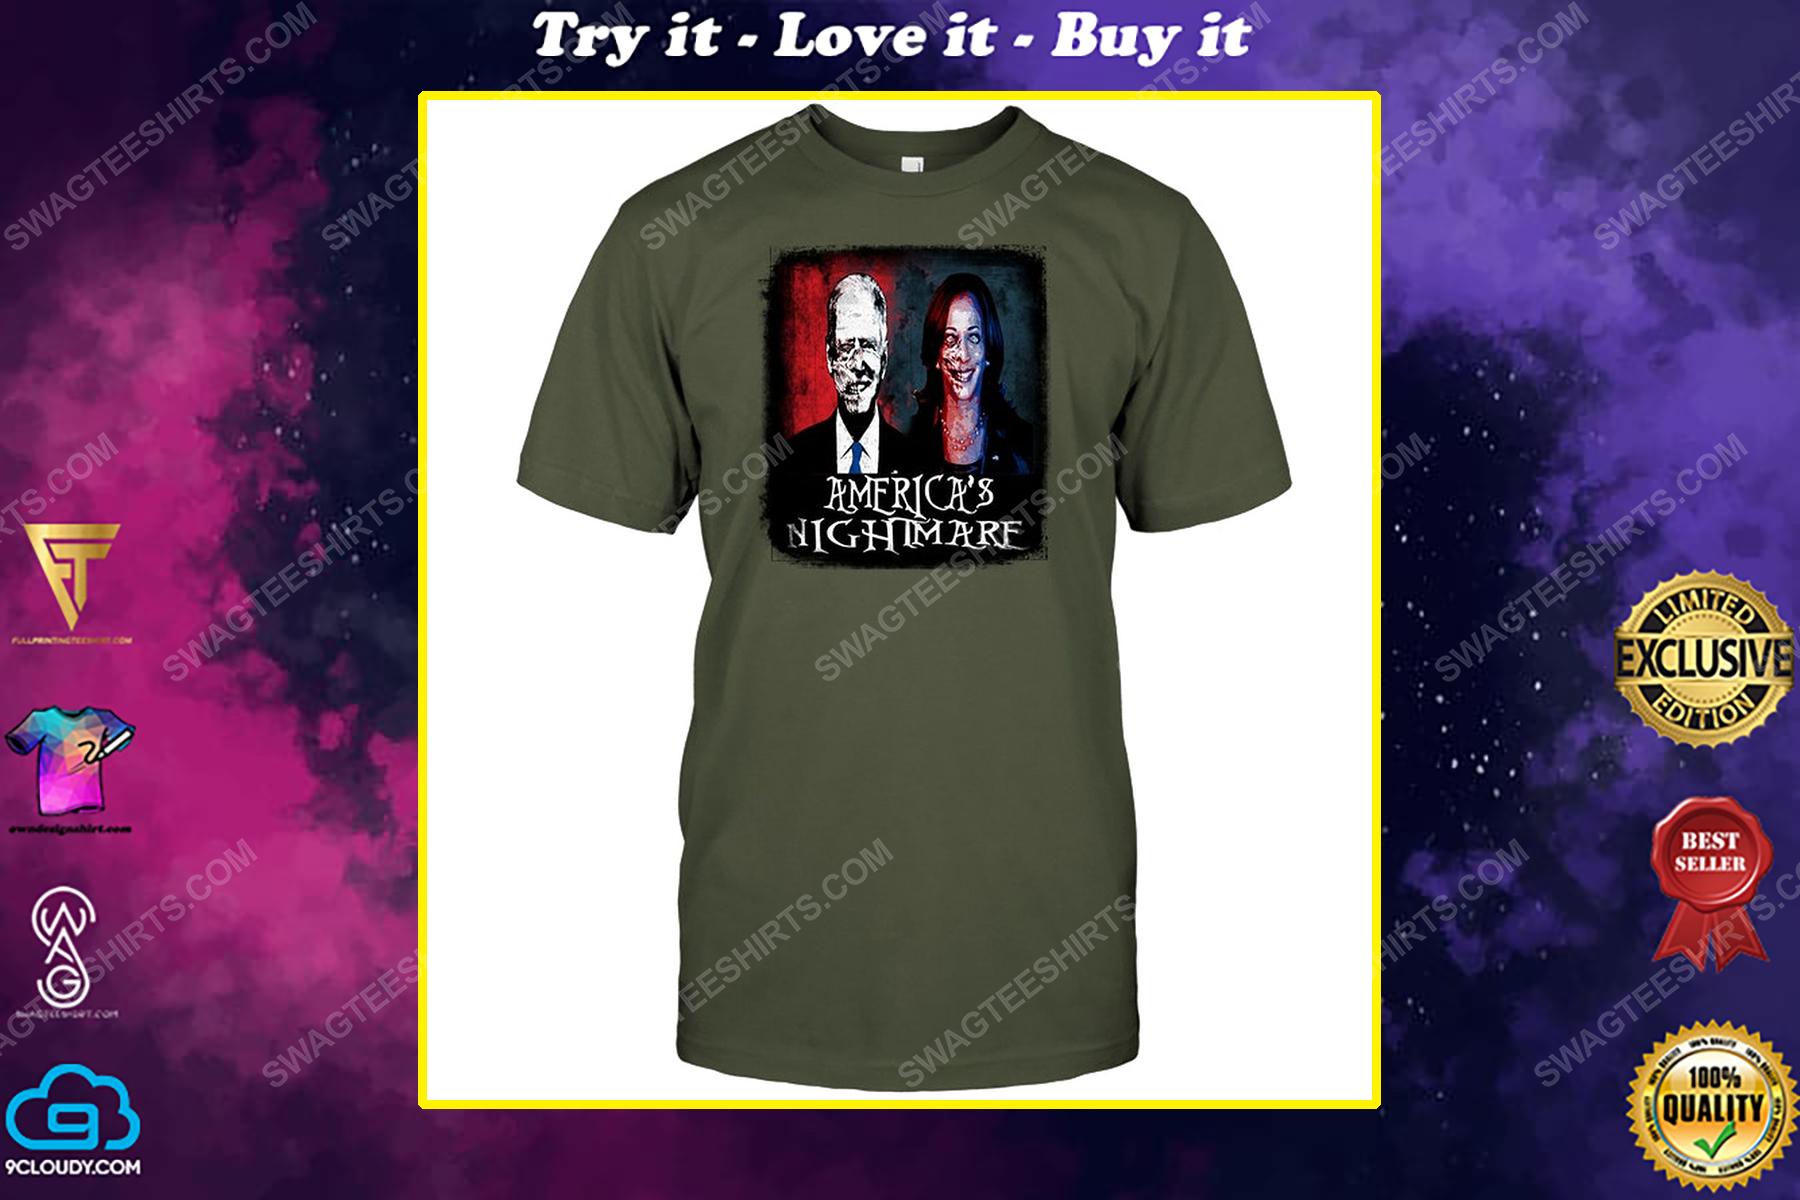 Joe biden and kamala harris america's nightmare political shirt